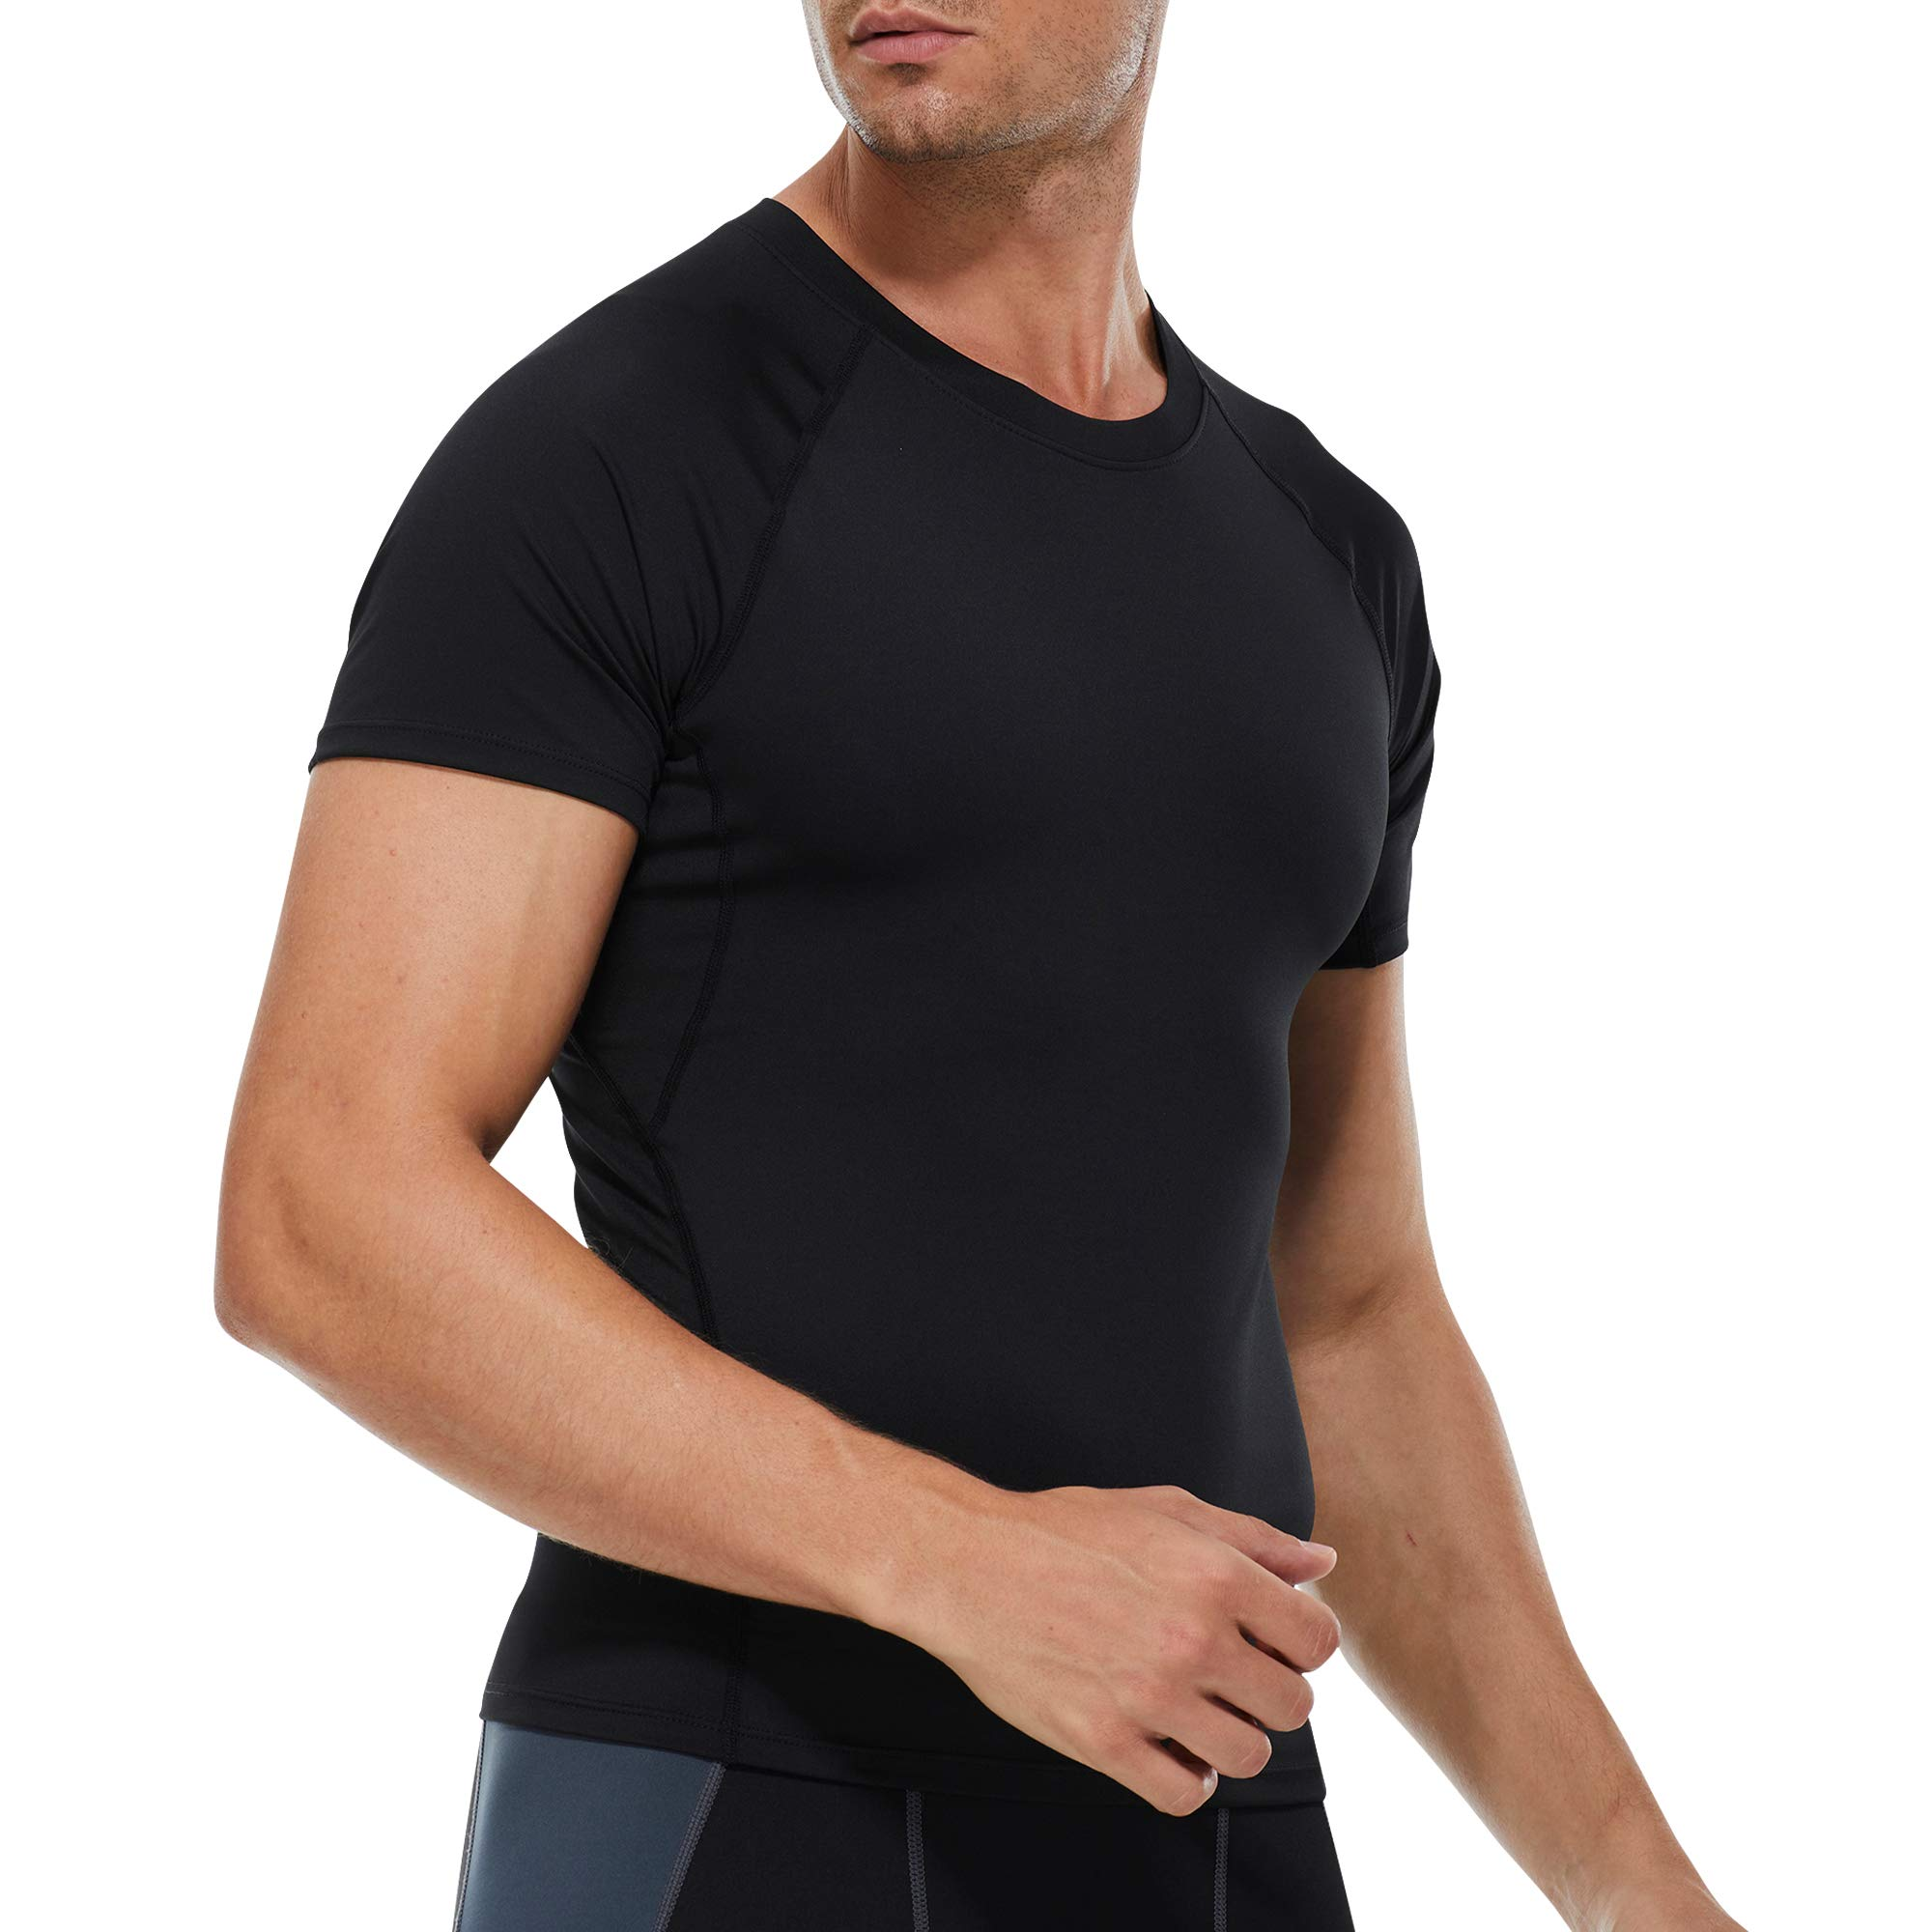 UOUA Men's Quick Dry Compression Shirt Short Sleeve Sports Tops Moisture Wicking Lightweight Cool Base Layer T-Shirt